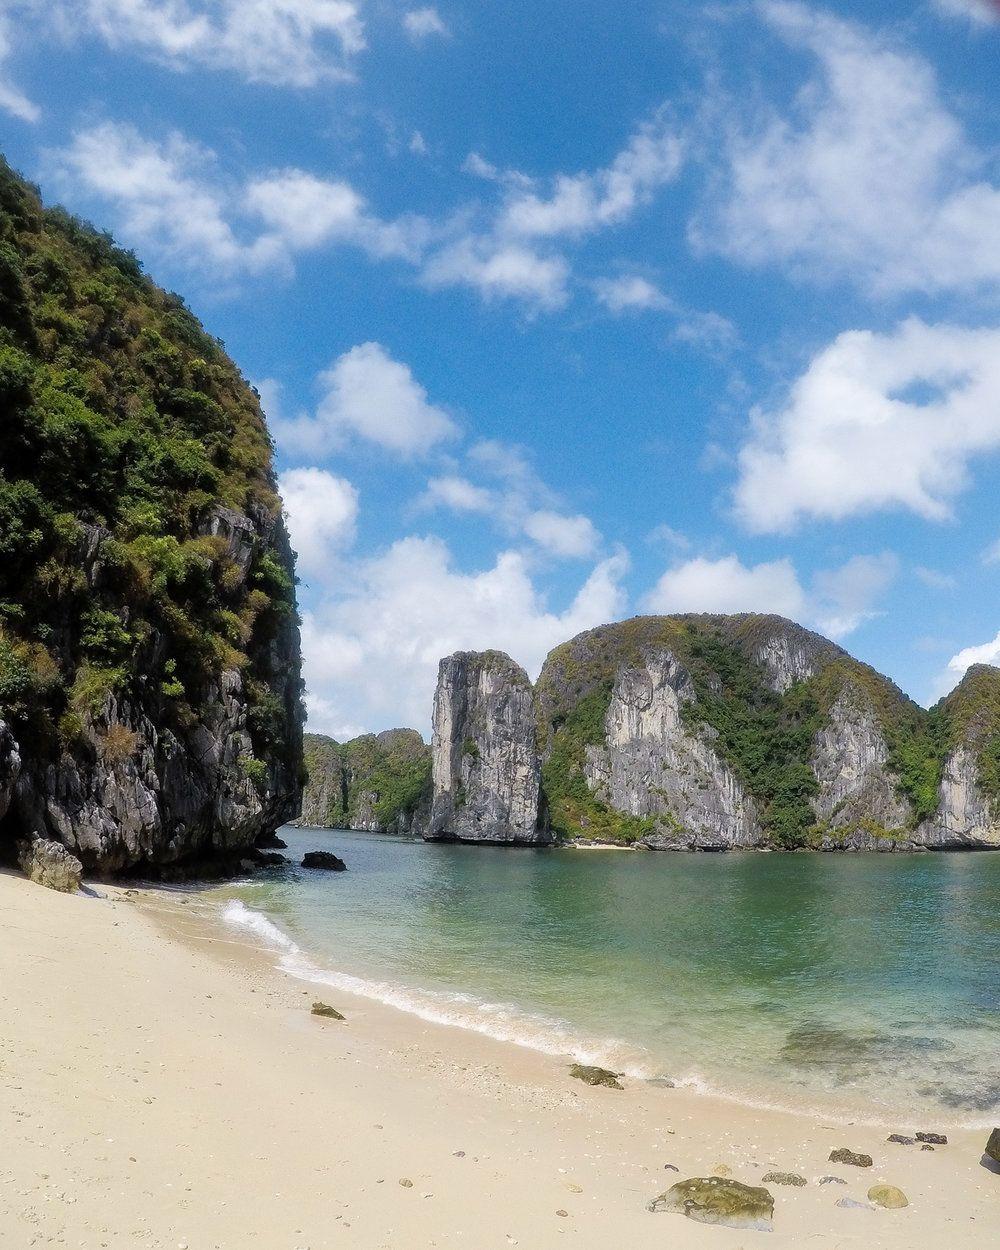 Vietnam Itinerary An epic 20 week trip from Hanoi to Hoi An — Walk ...